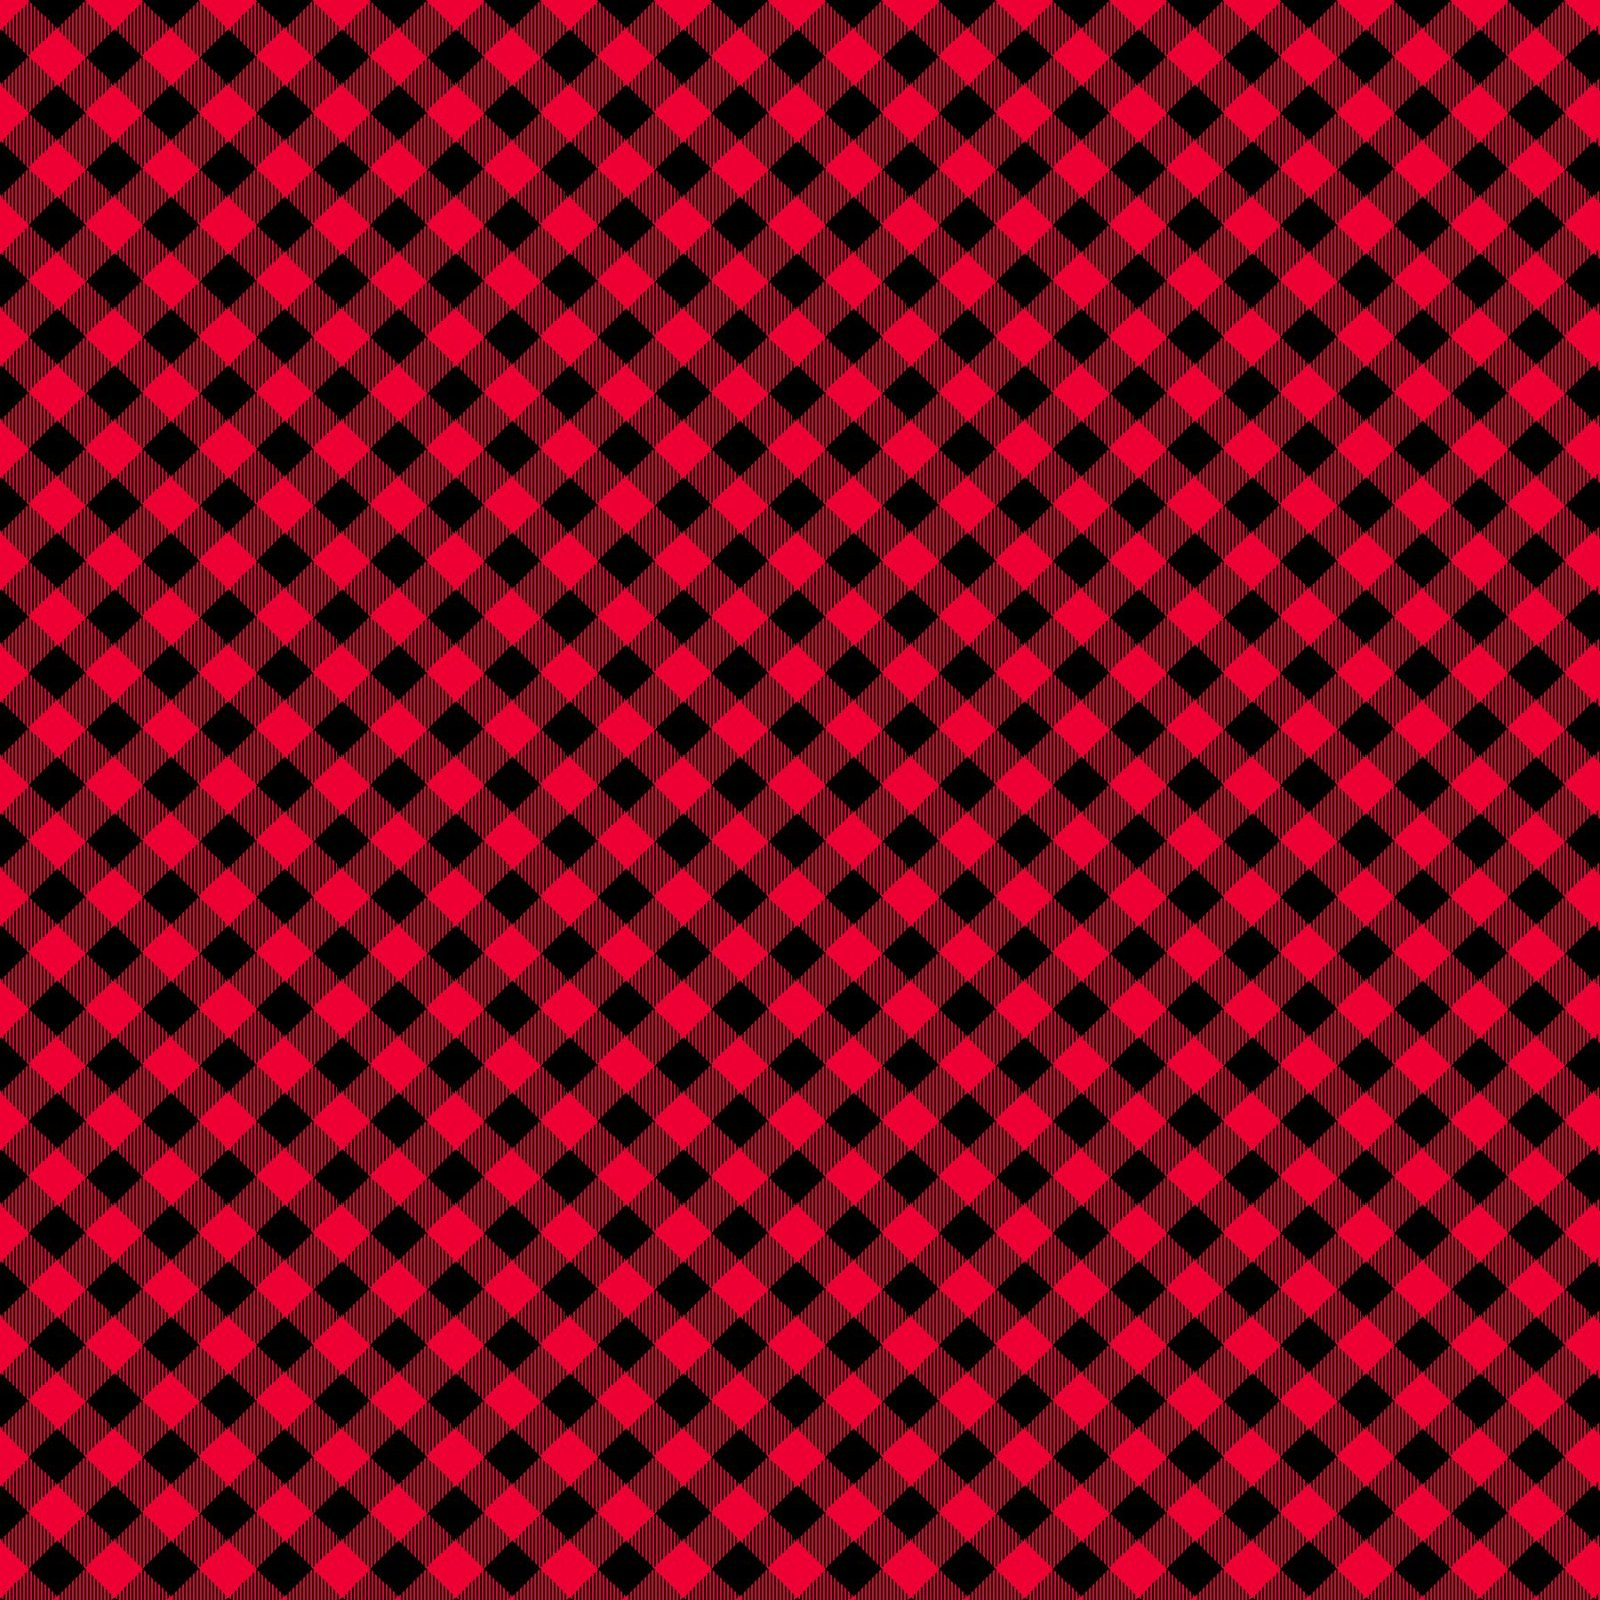 HG-Chelsea's Checks 9700-89 Red/Black - 1/8 Check